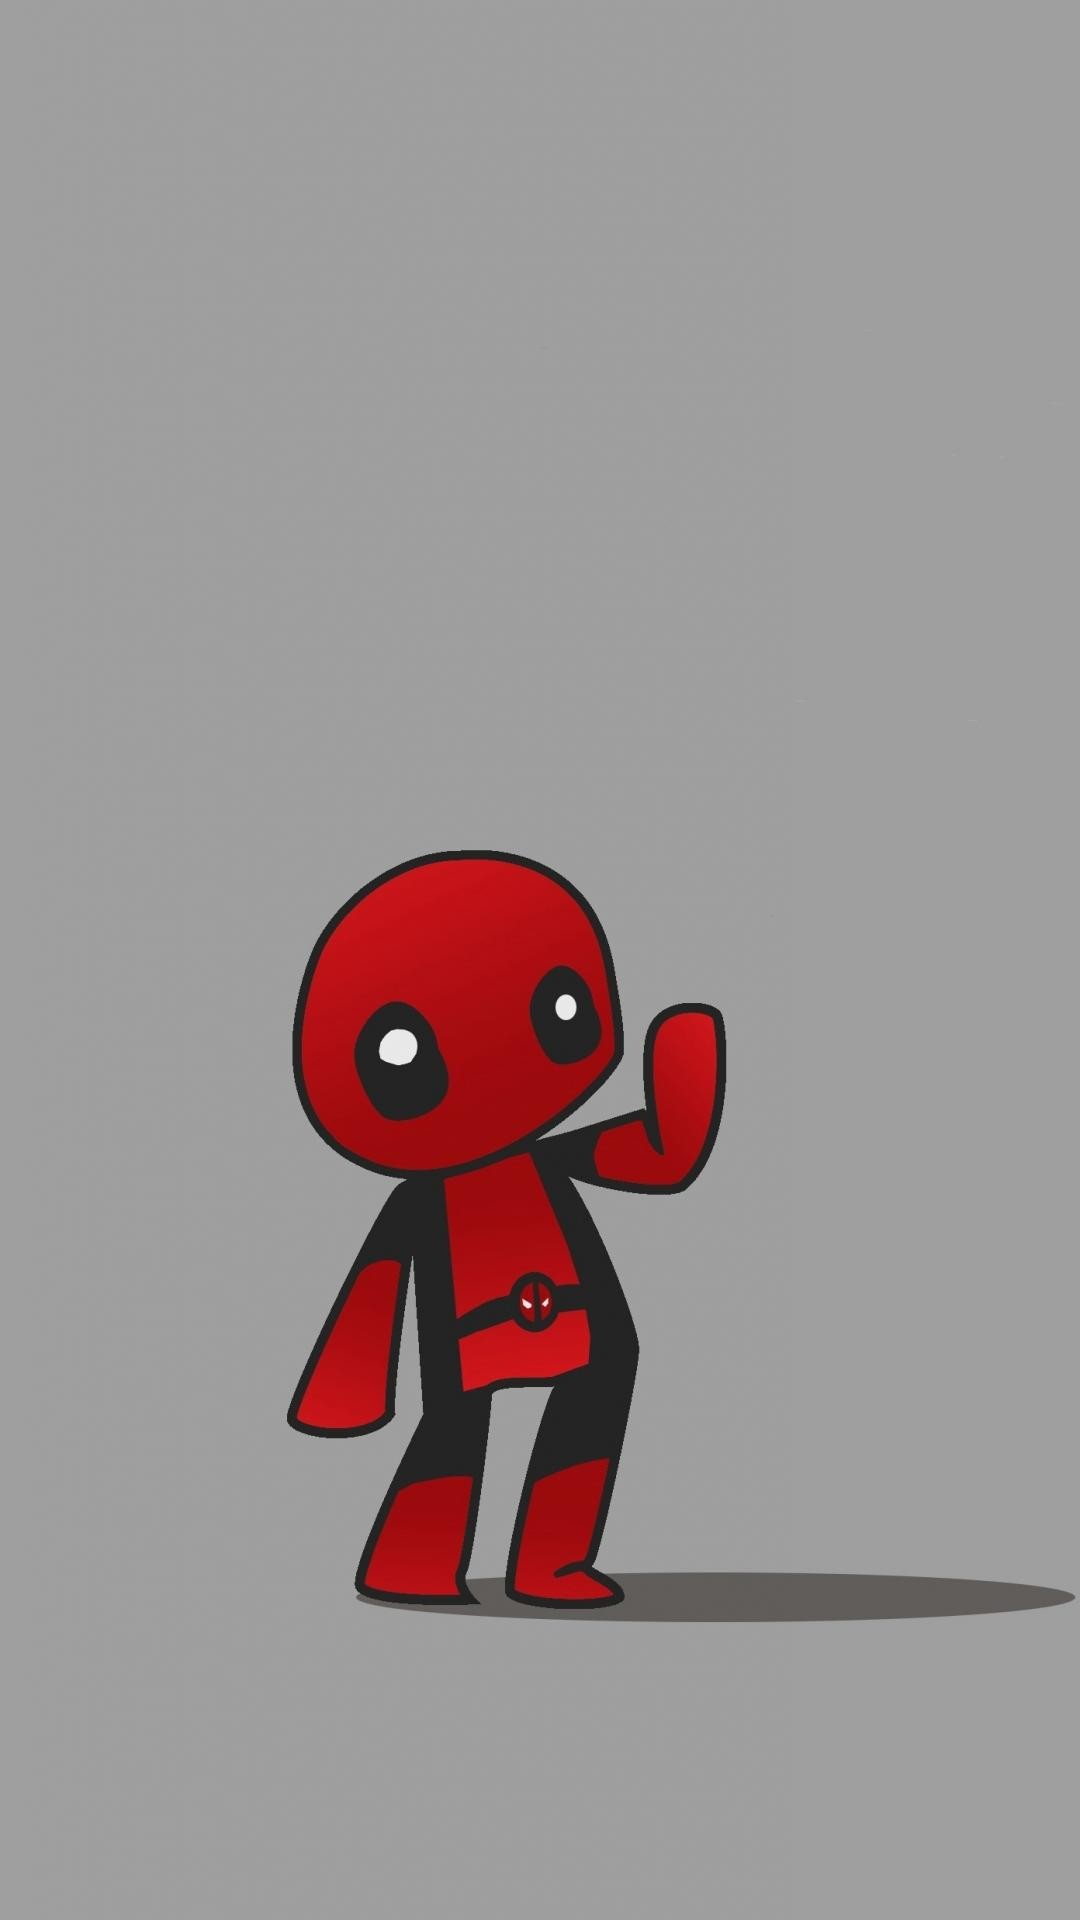 wallpaper.wiki-Funny-Deadpool-Iphone-Wallpaper-PIC-WPD009317